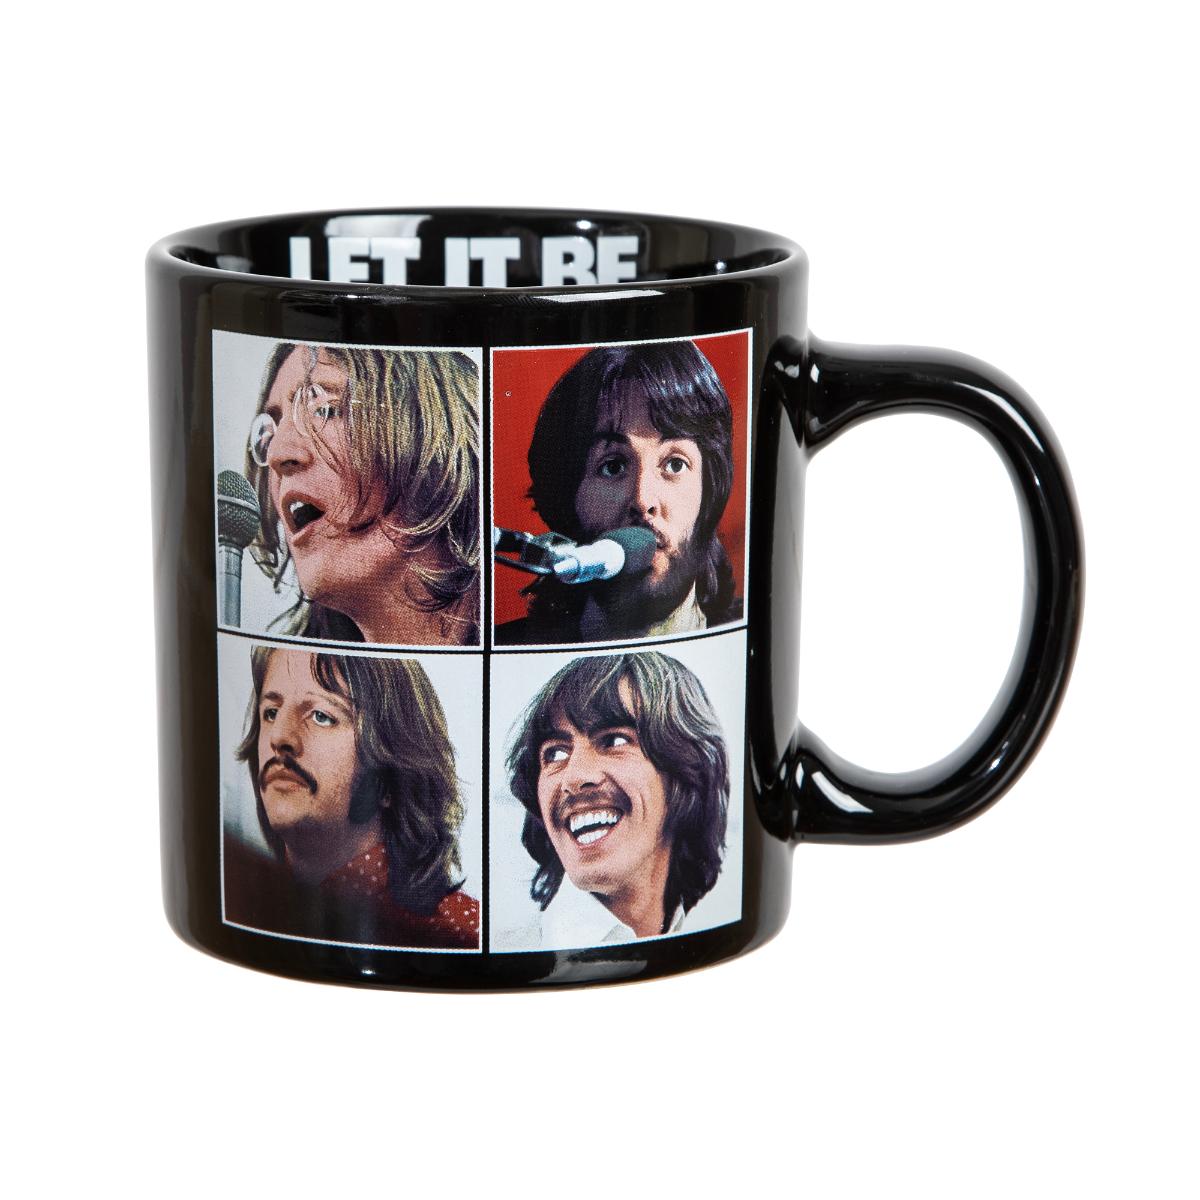 Let It Be 16oz Ceramic Mug